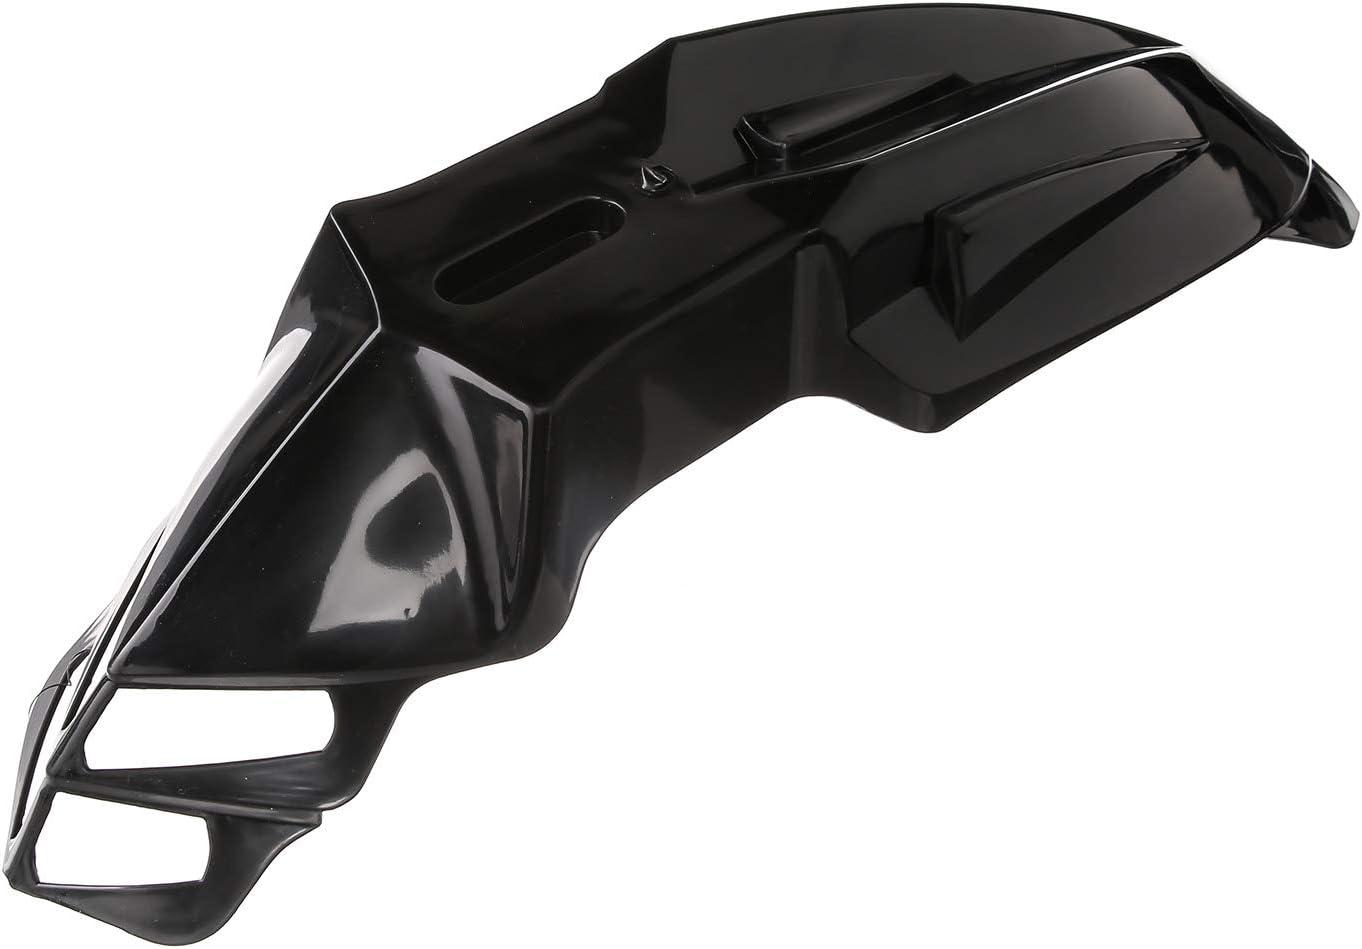 Akf Kotflügel Vorn Plastik Enduro Für Simson S51 S50 S53 Enduro Auto